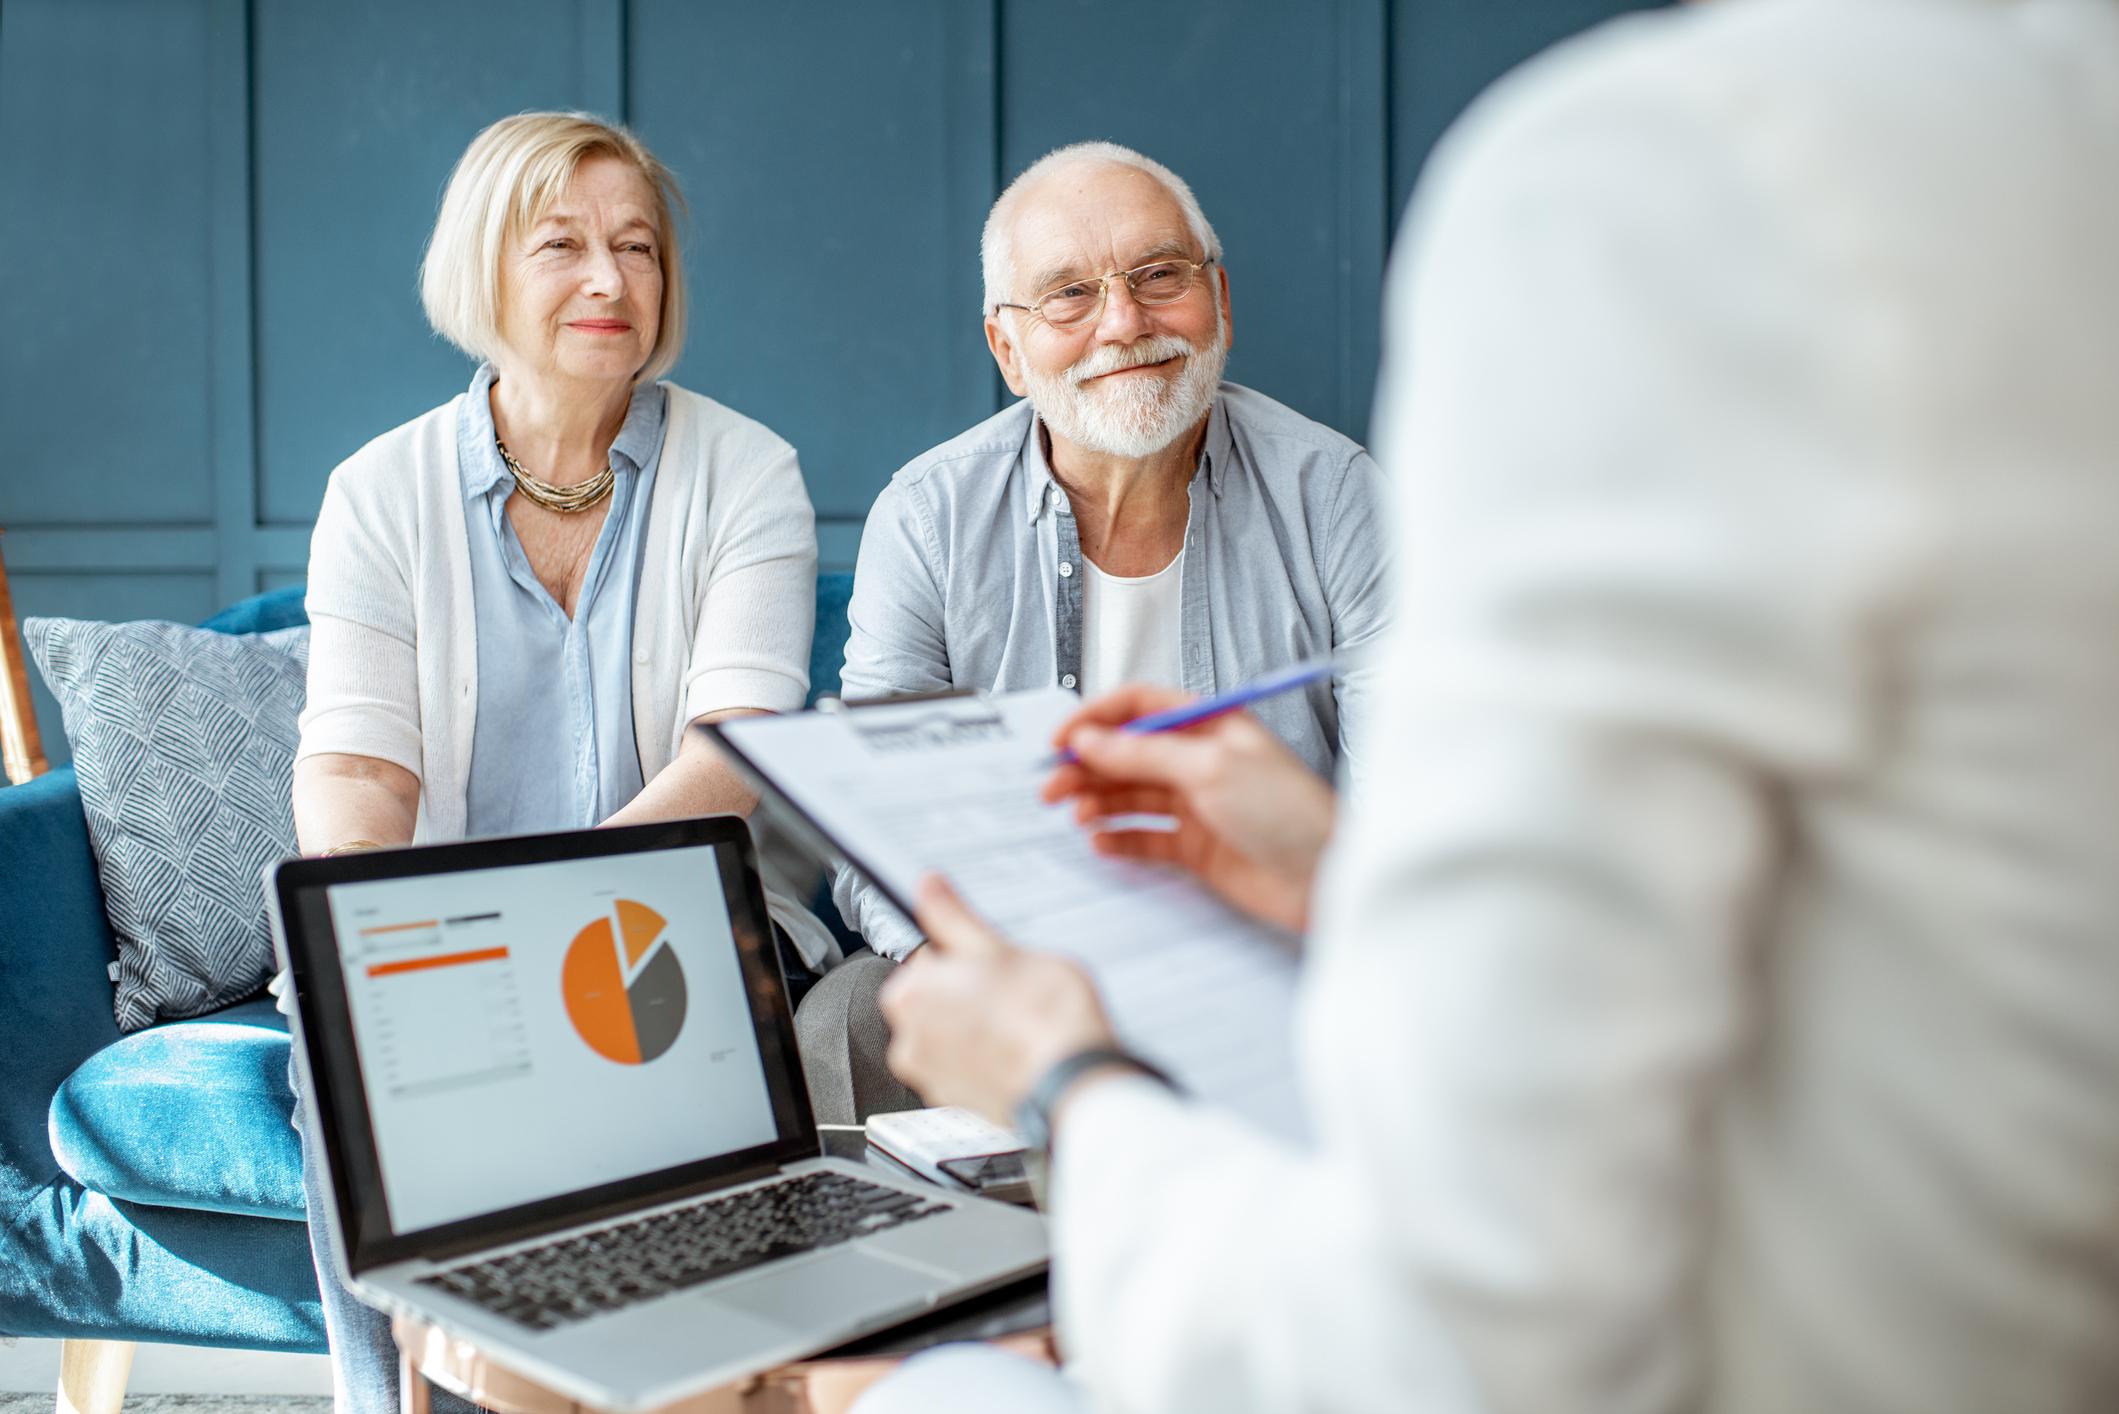 A senior couple meets with their financial advisor.